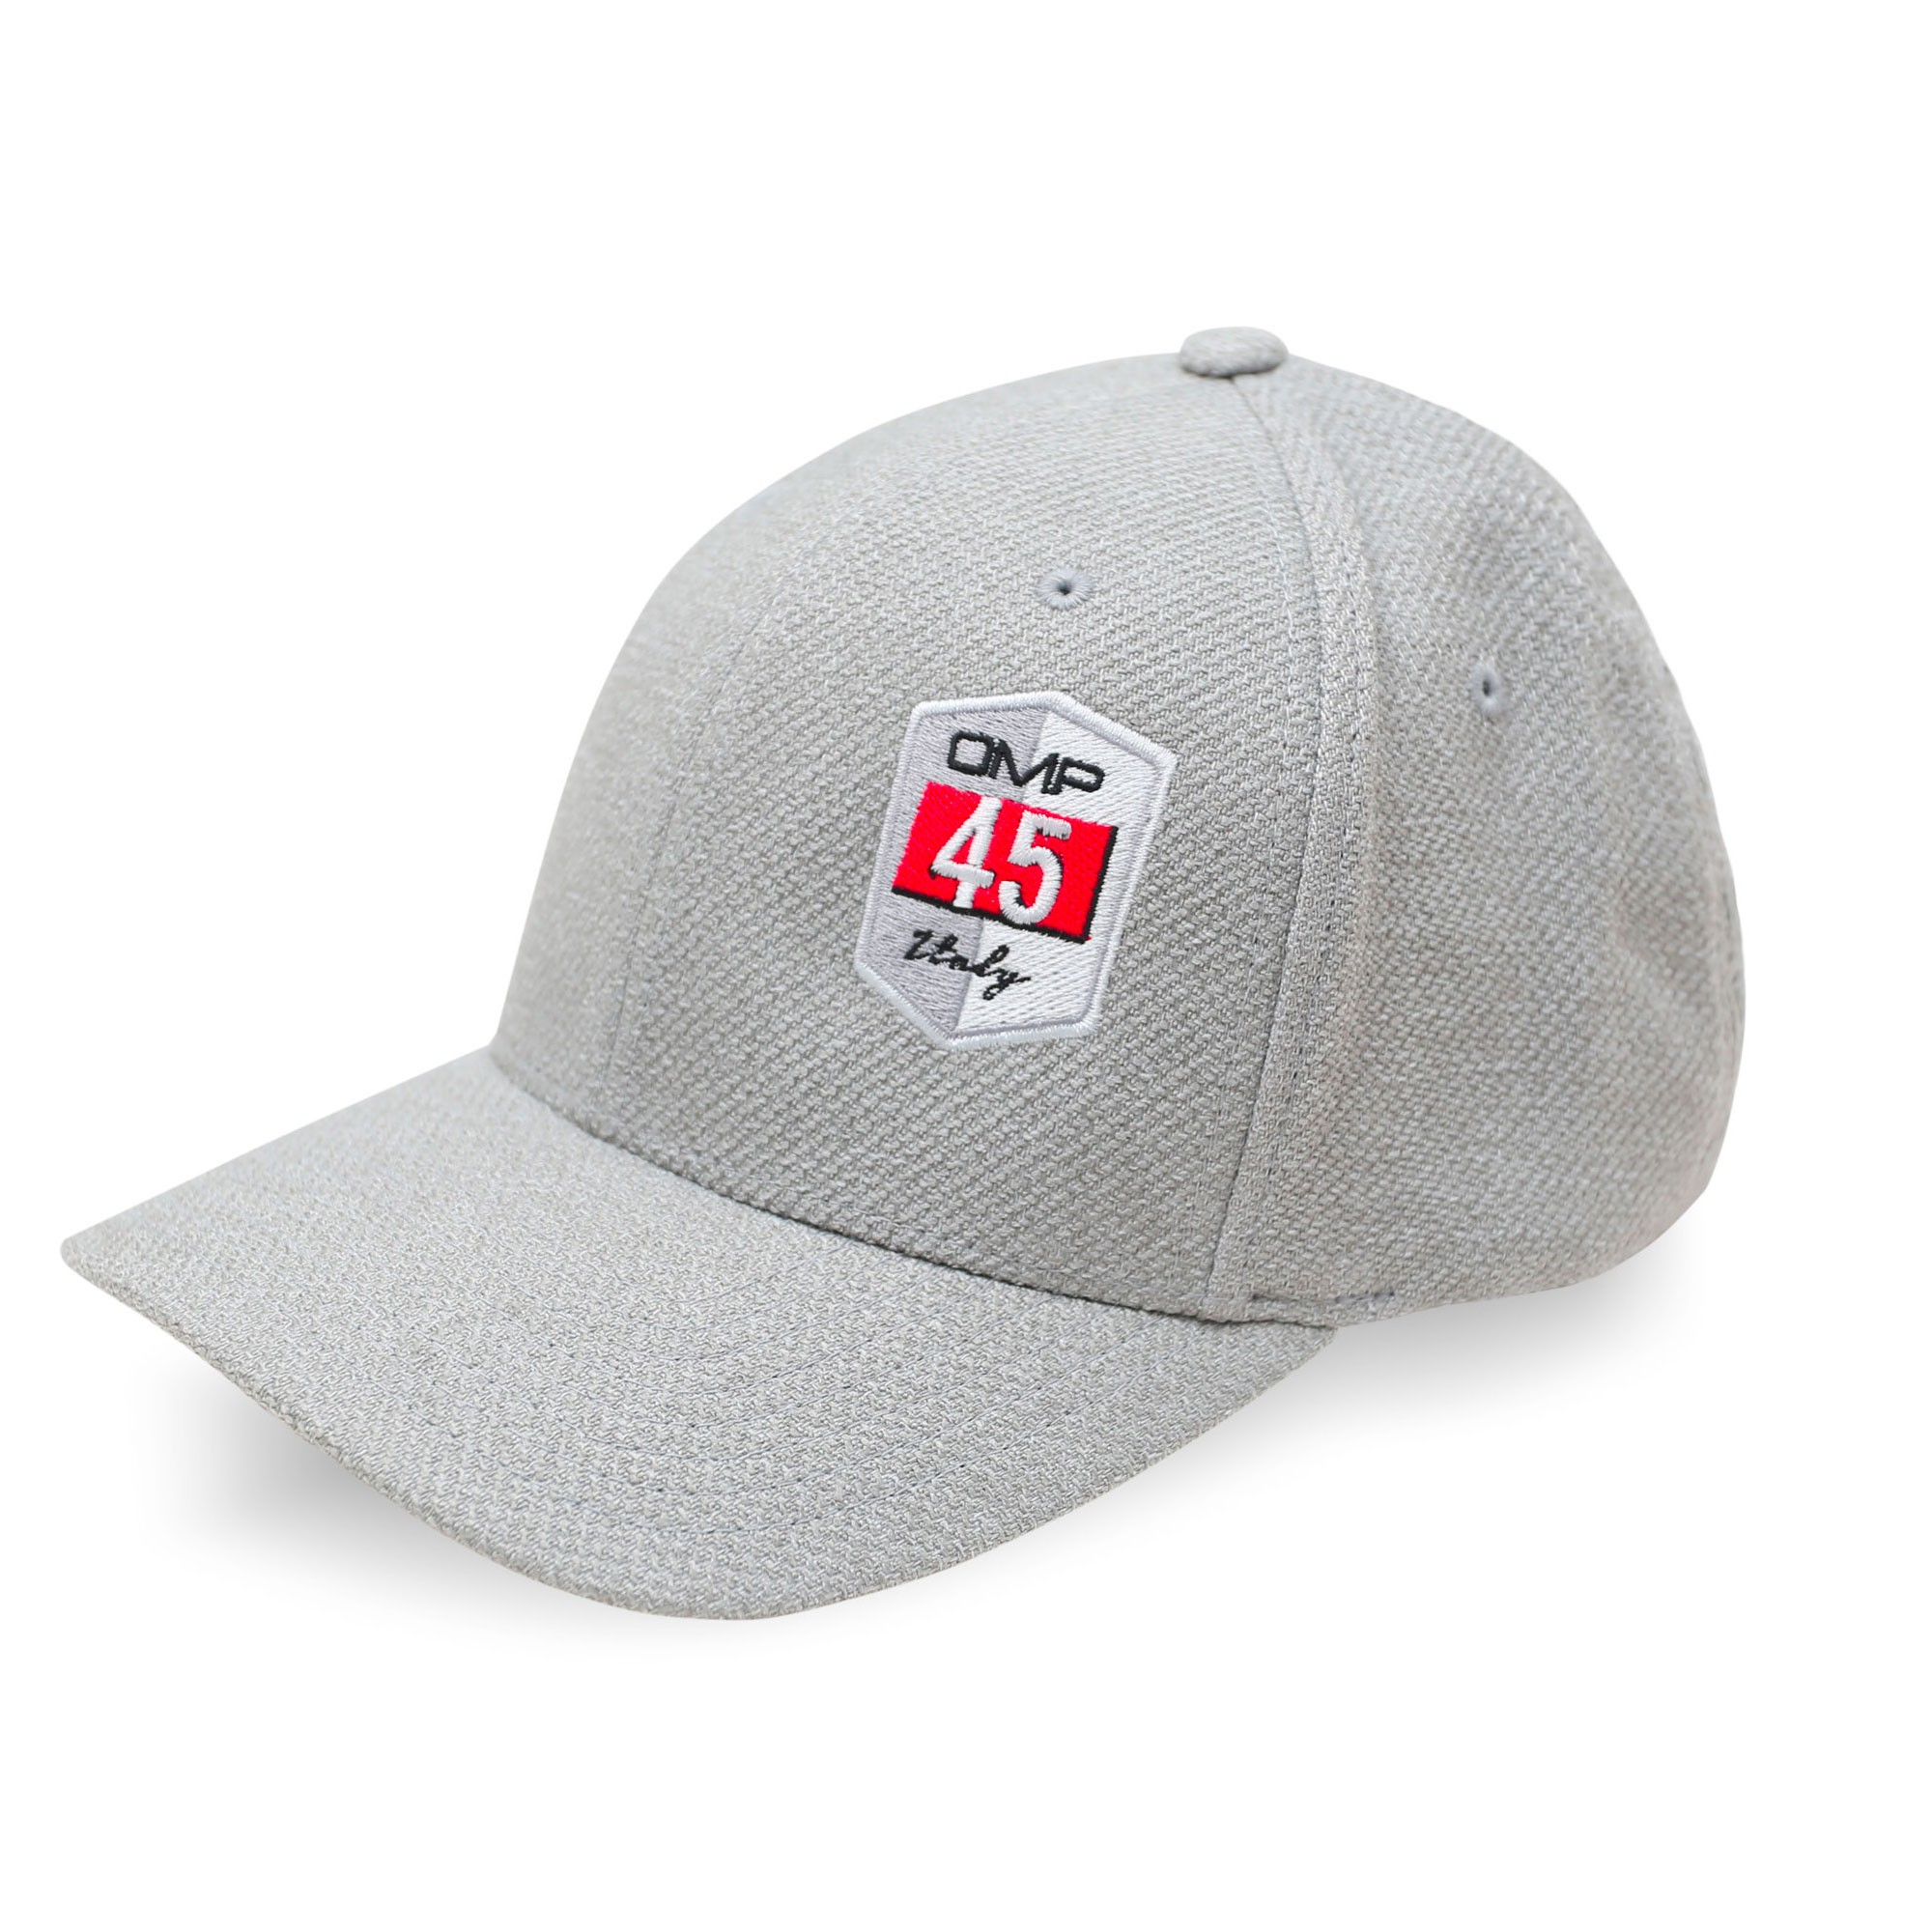 OMP Heritage Hat